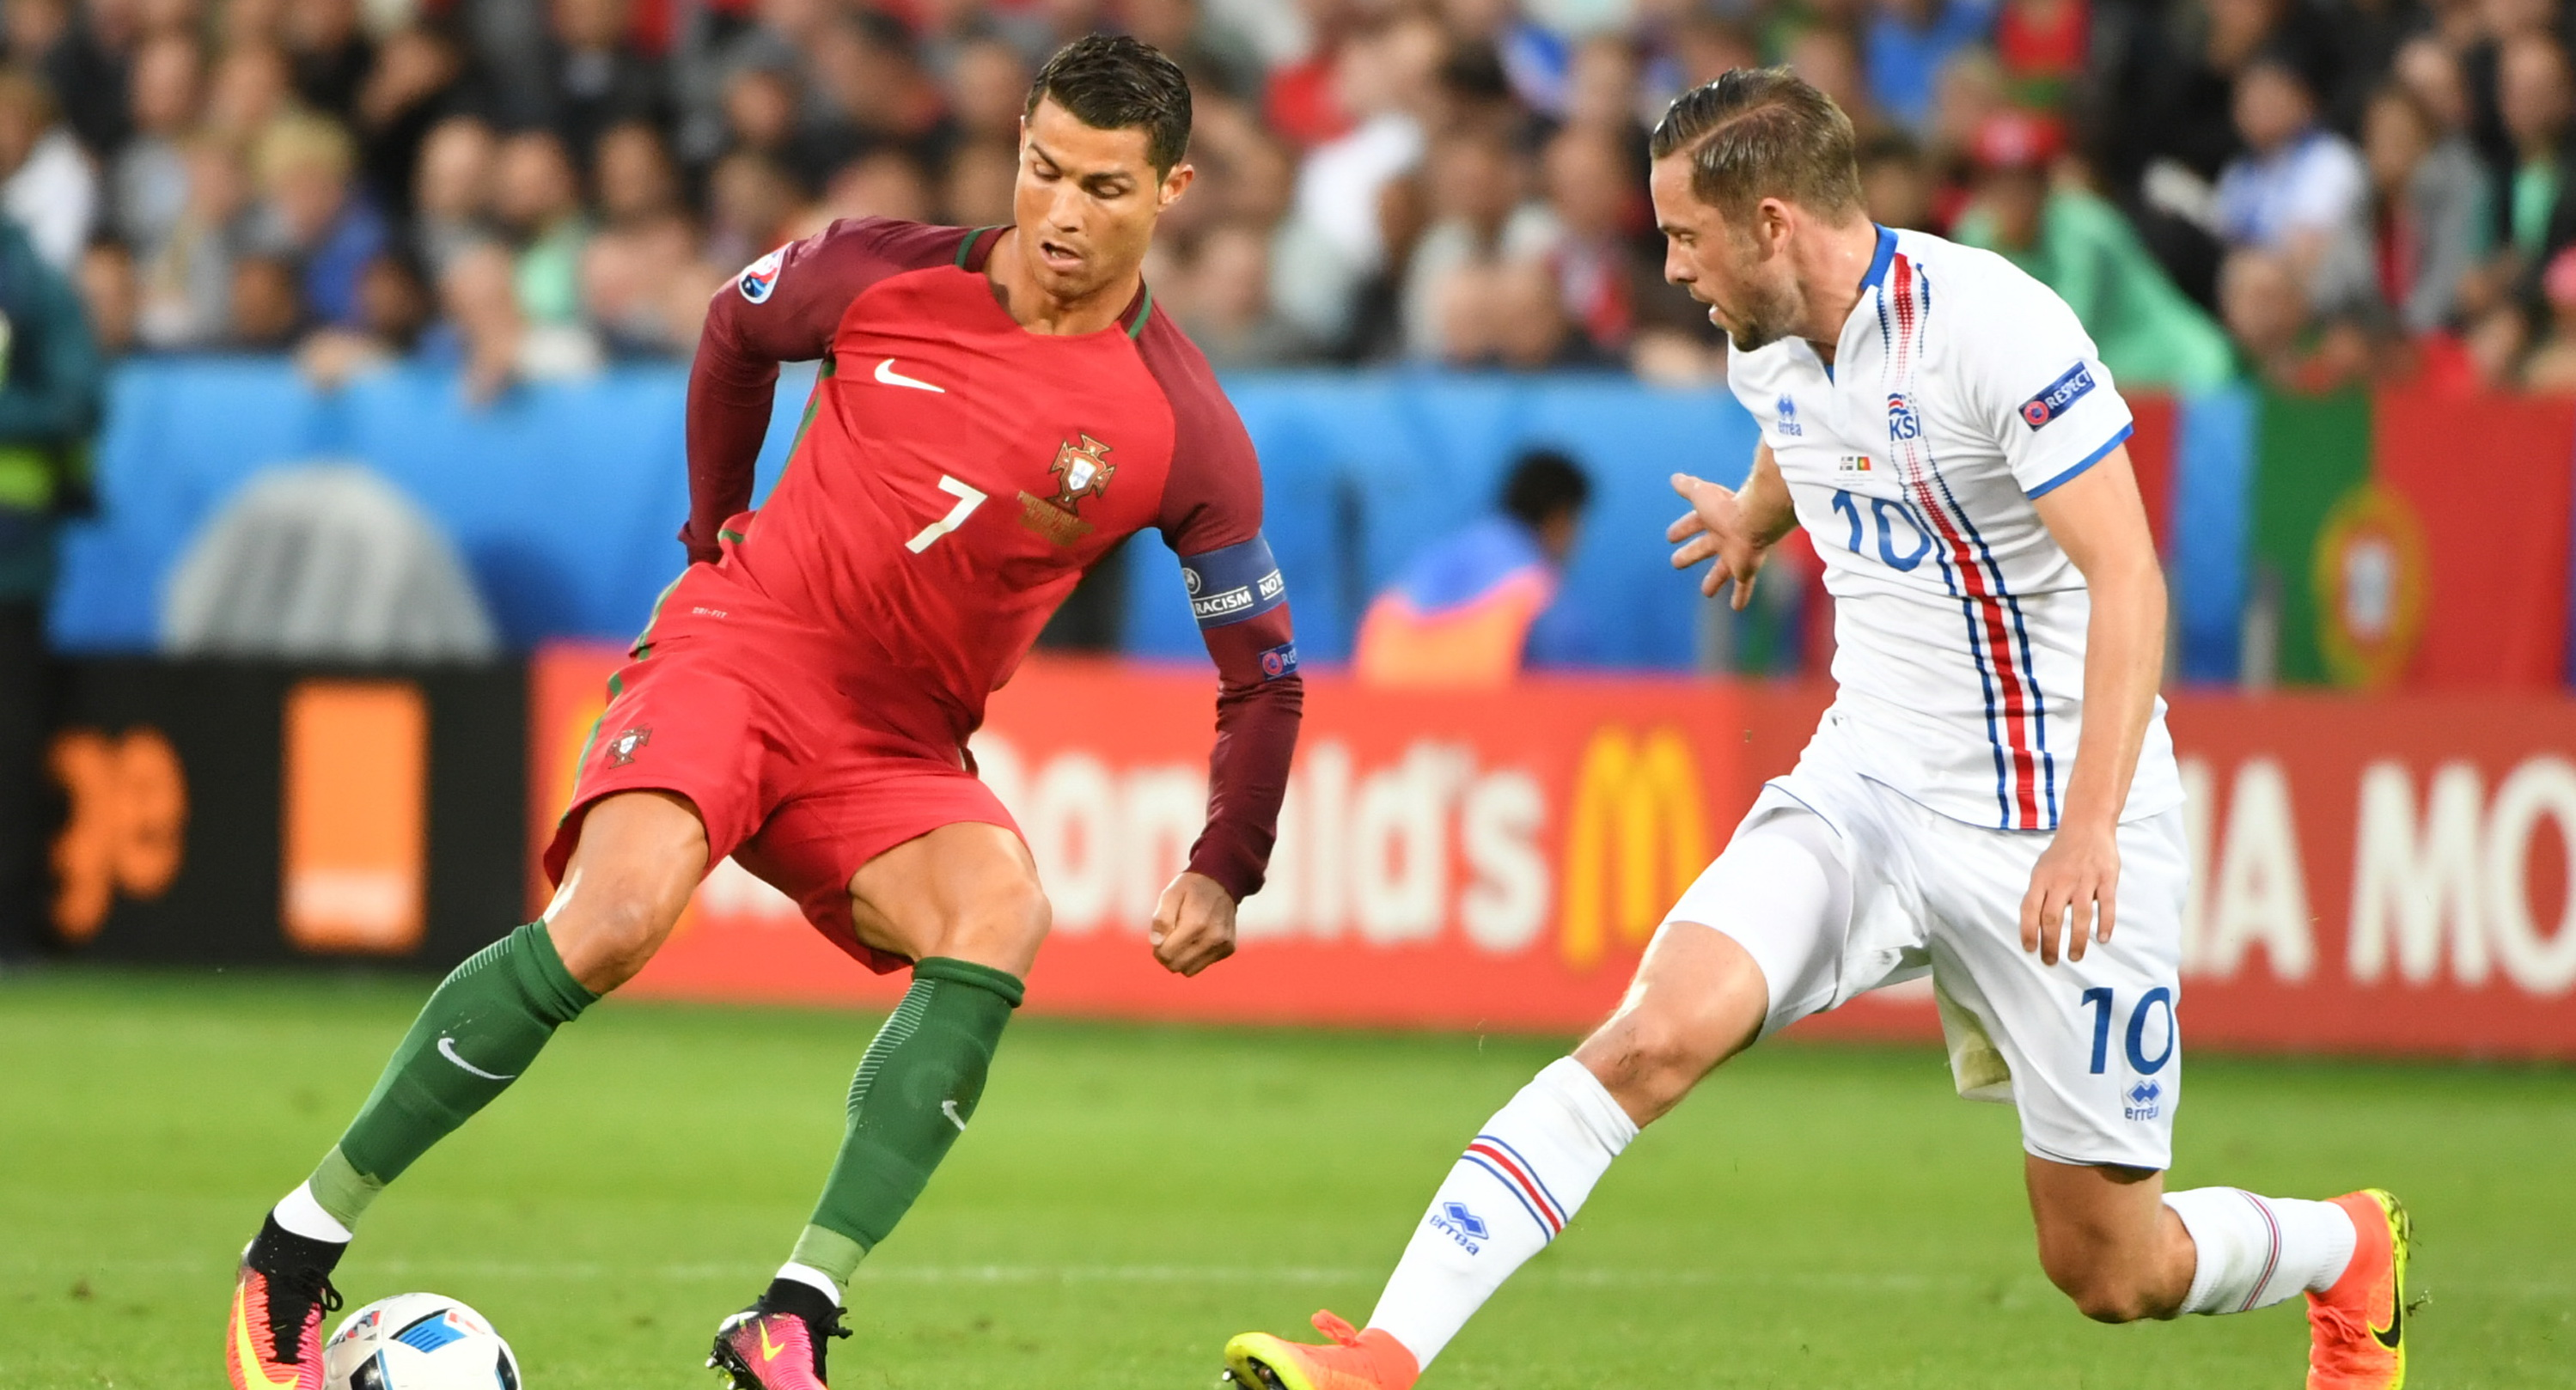 PORTUGALIA - ISLANDA 1-1. Ziua surprizelor la UEFA EURO 2016: Islanda a obtinut un egal istoric. REZUMAT VIDEO